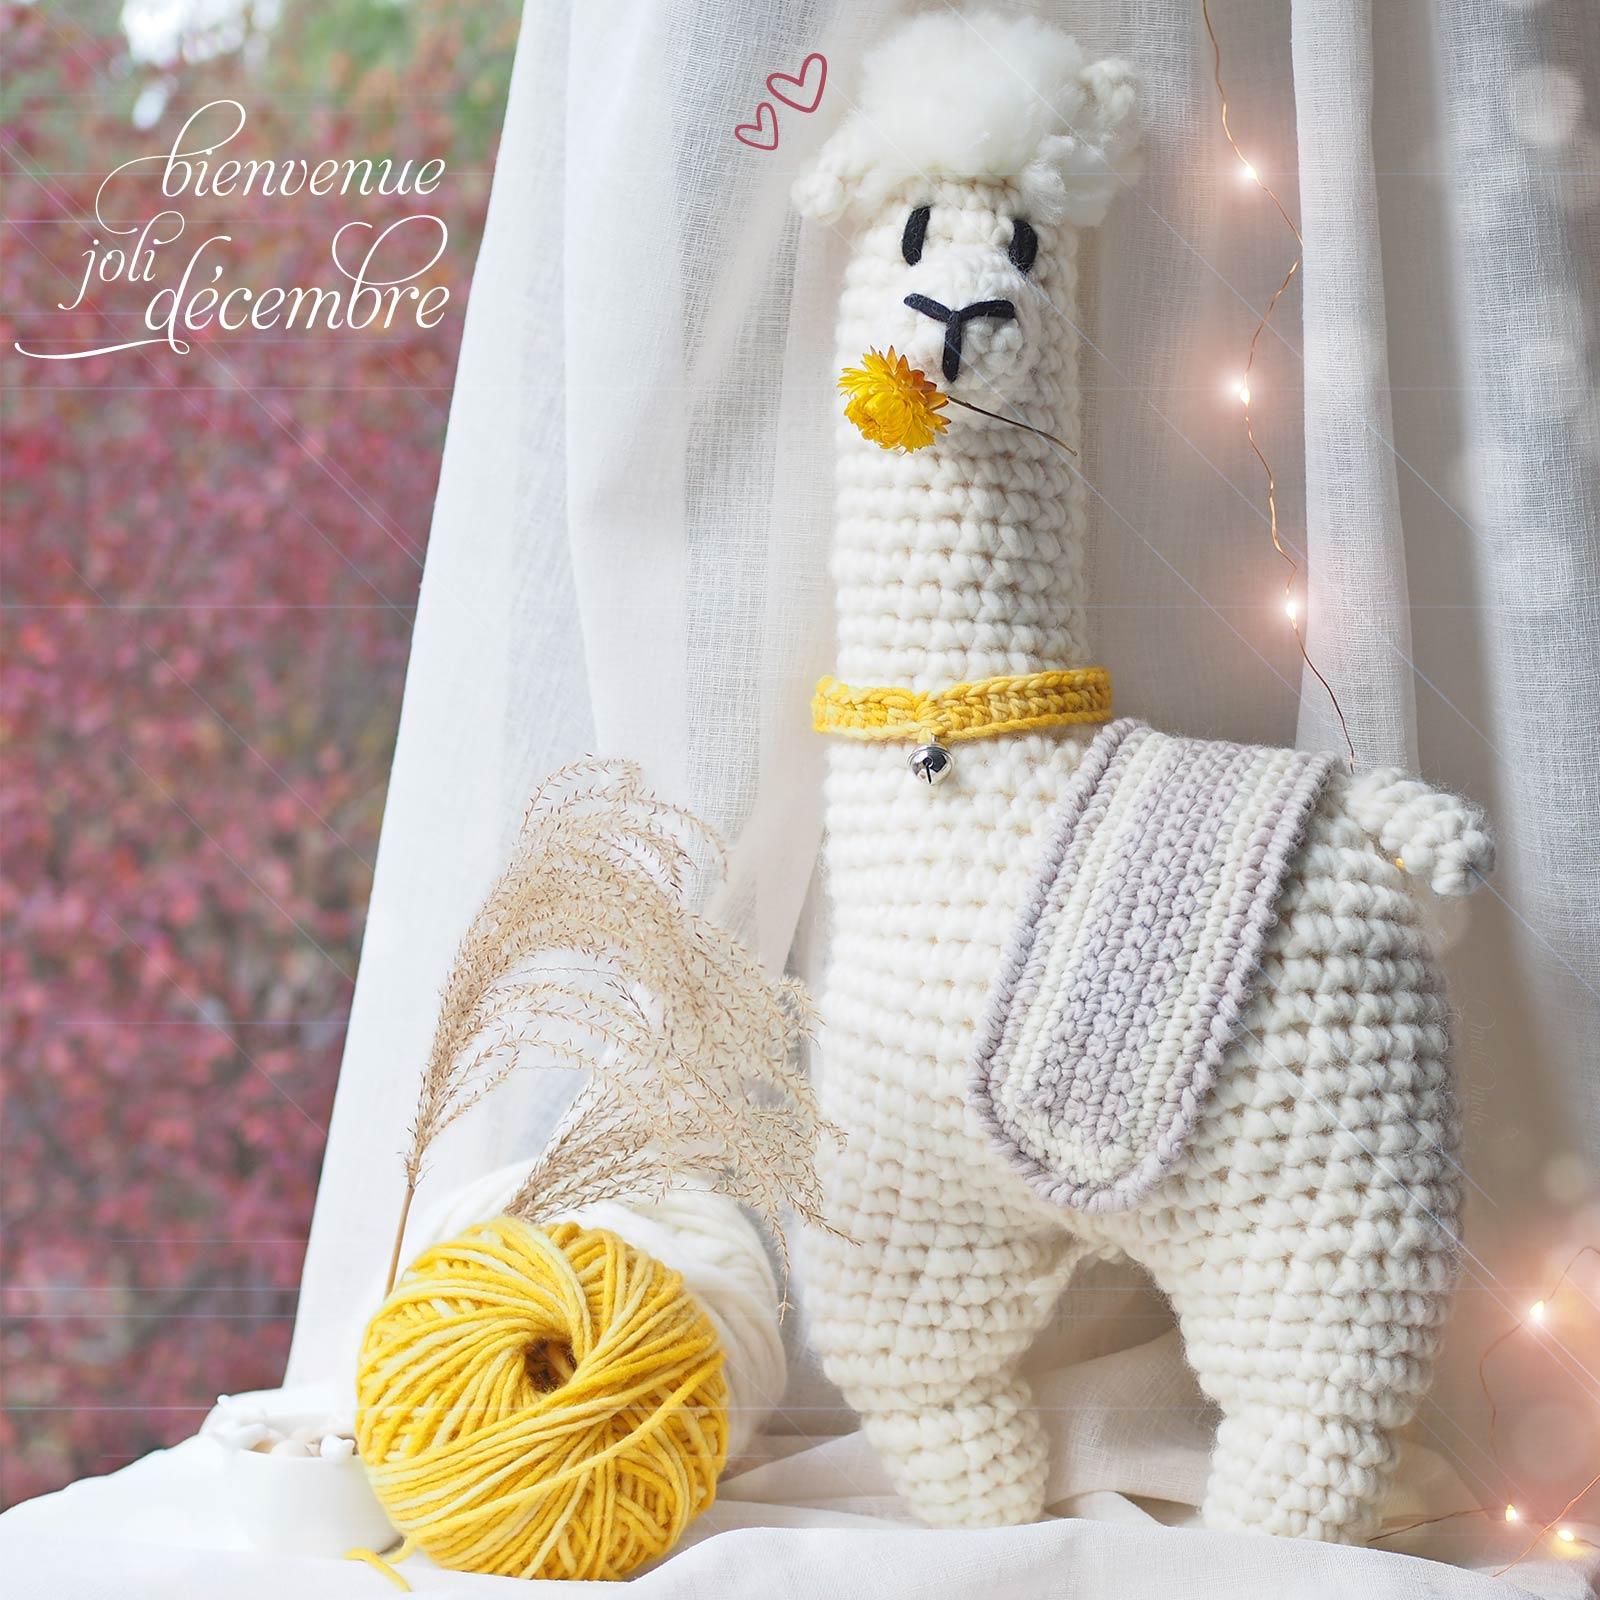 alpaca-crochet-alpaga-geant-amigurumi-camomille-laboutiquedemelimelo